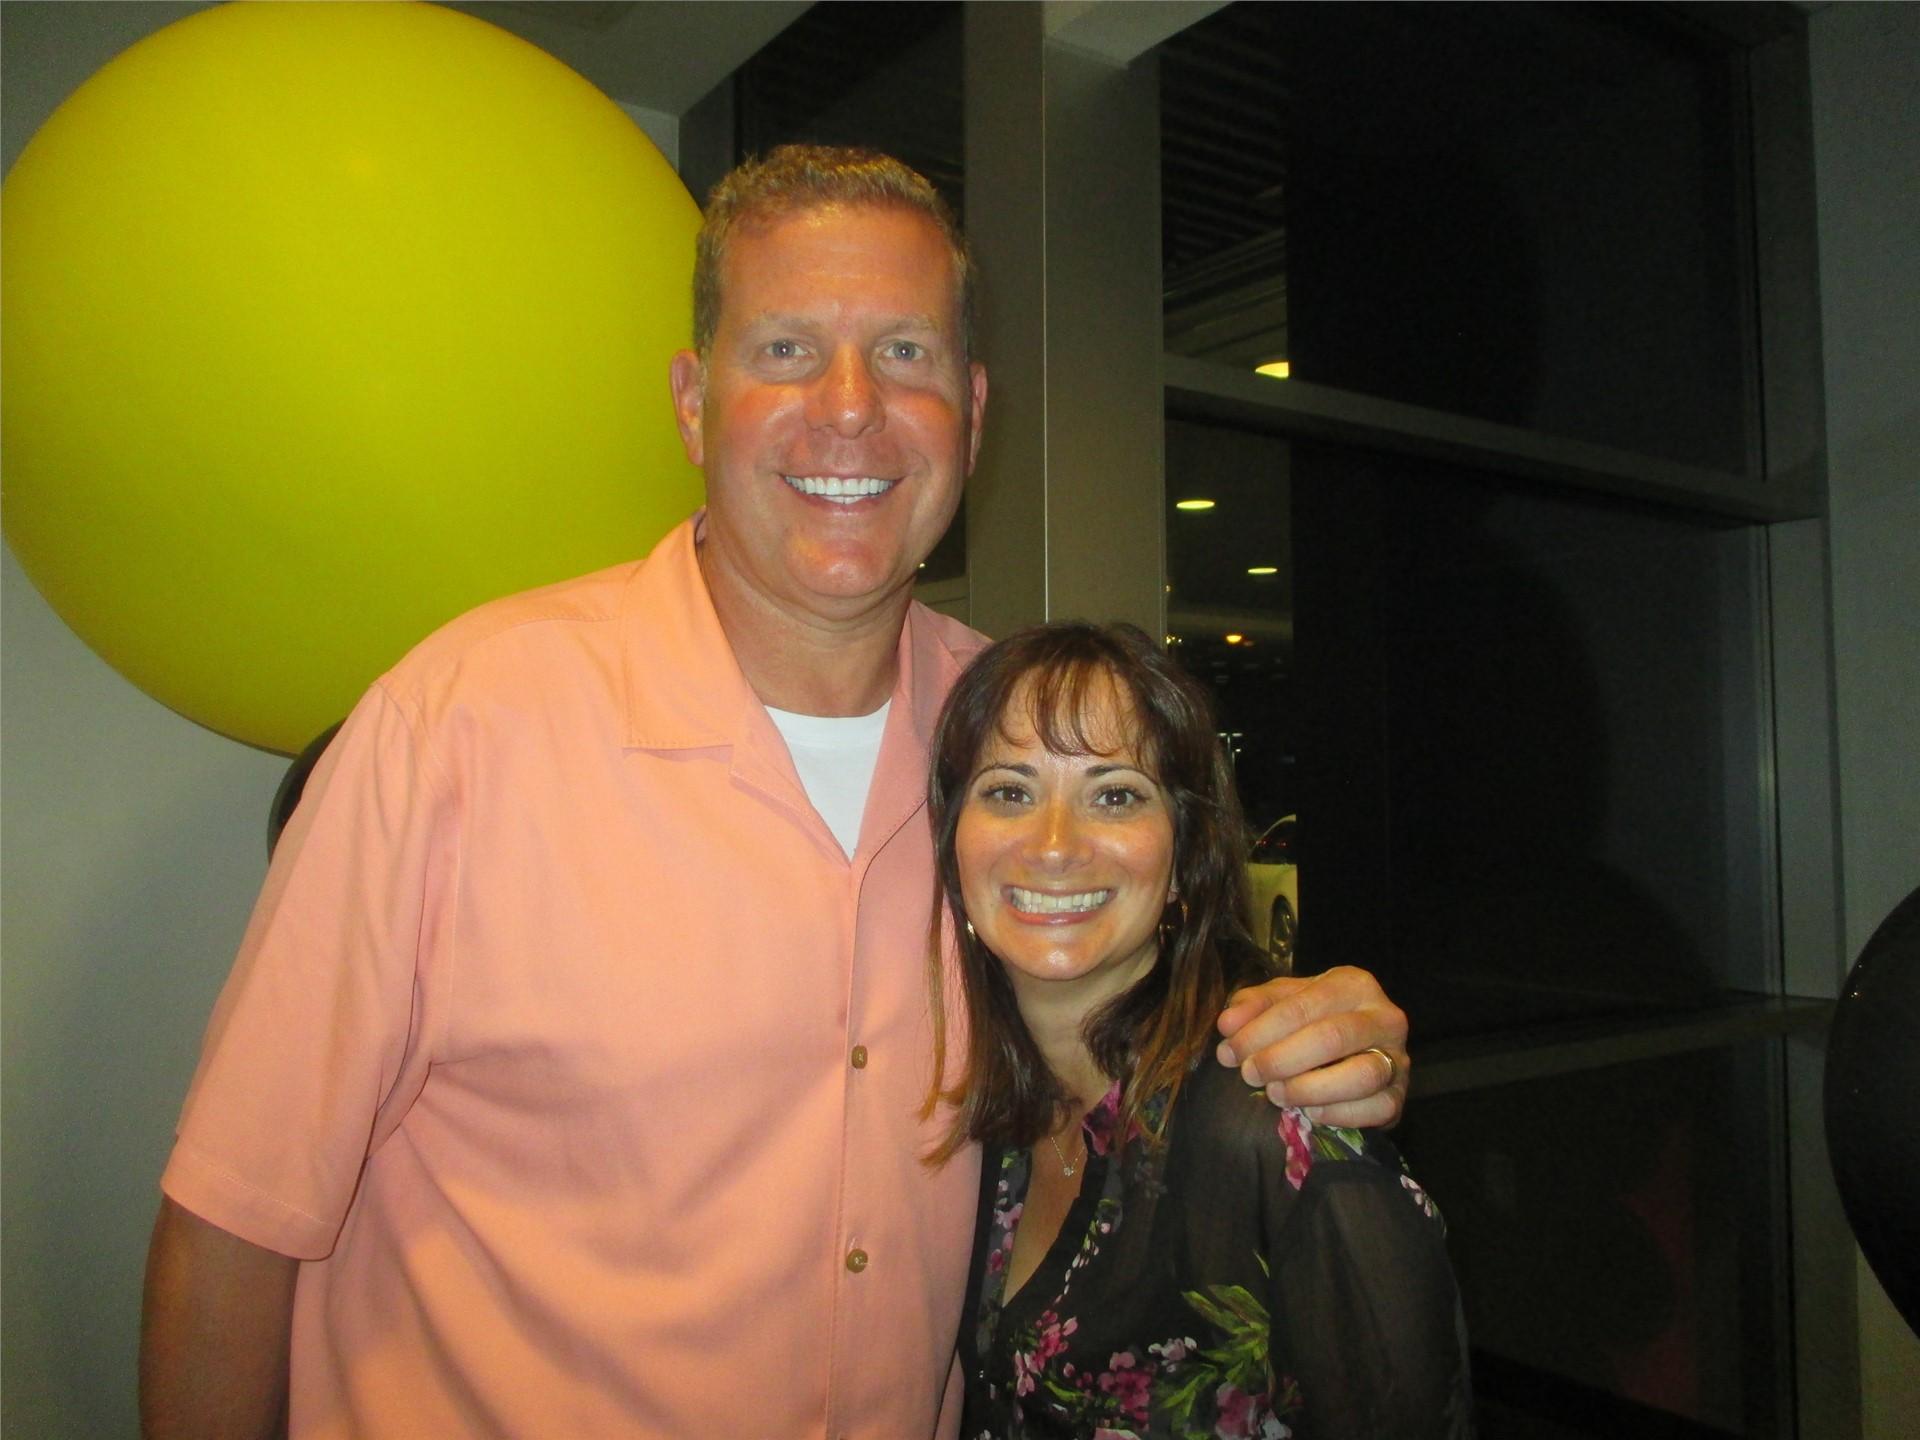 Booster Treasurer Robert Marks and Beachwood Foundation Board Member Jen Stern